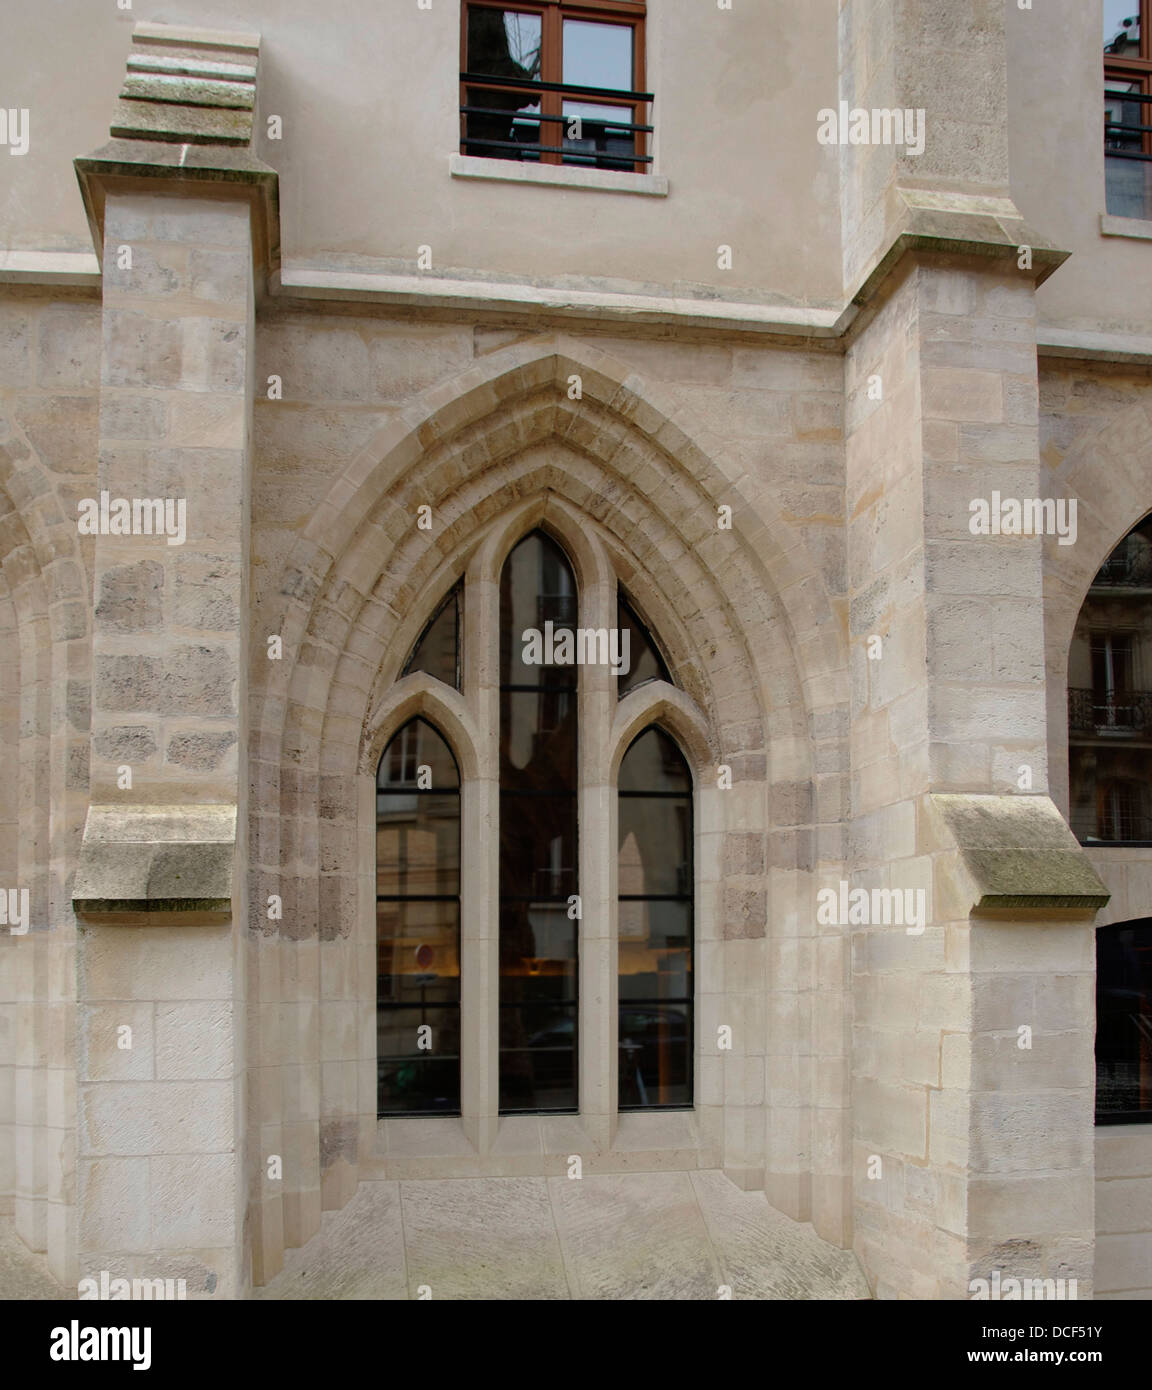 A gothic (13th century) trifora window, 'Collège des Bernardins', Paris. - Stock Image